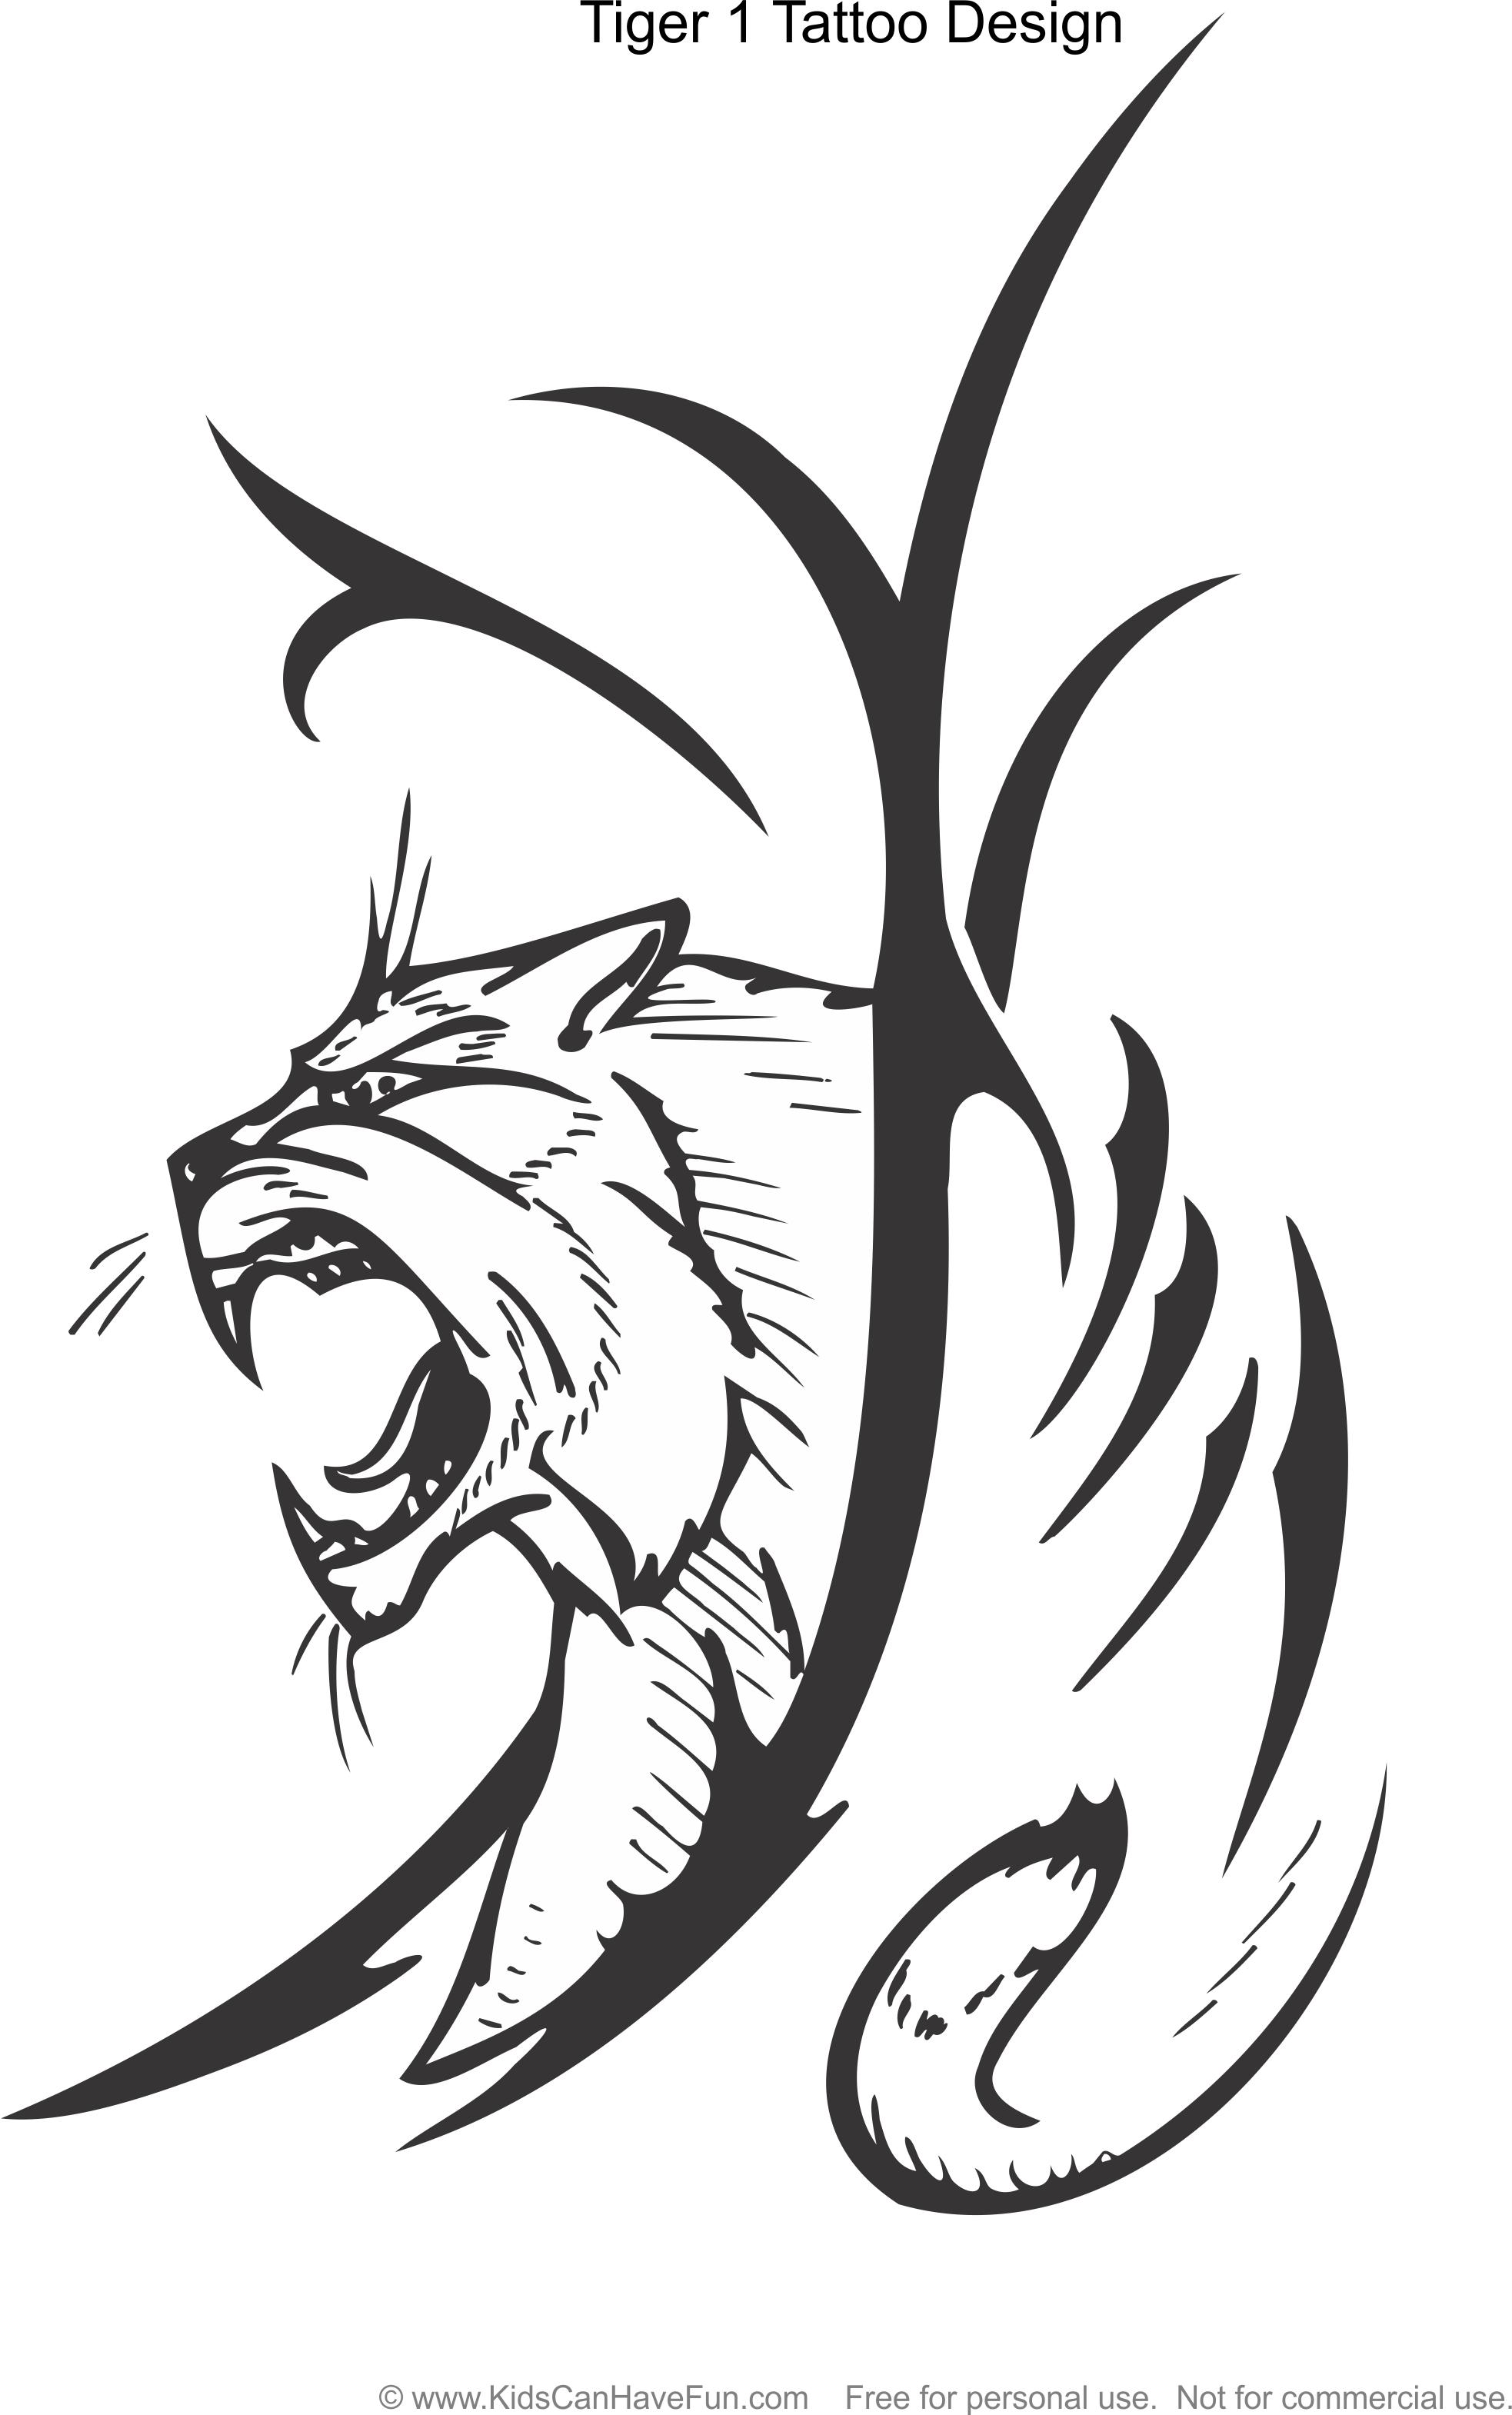 Tiger 1 Tattoo Design Coloring Page Kidscanhavefun Coloringhtm Color